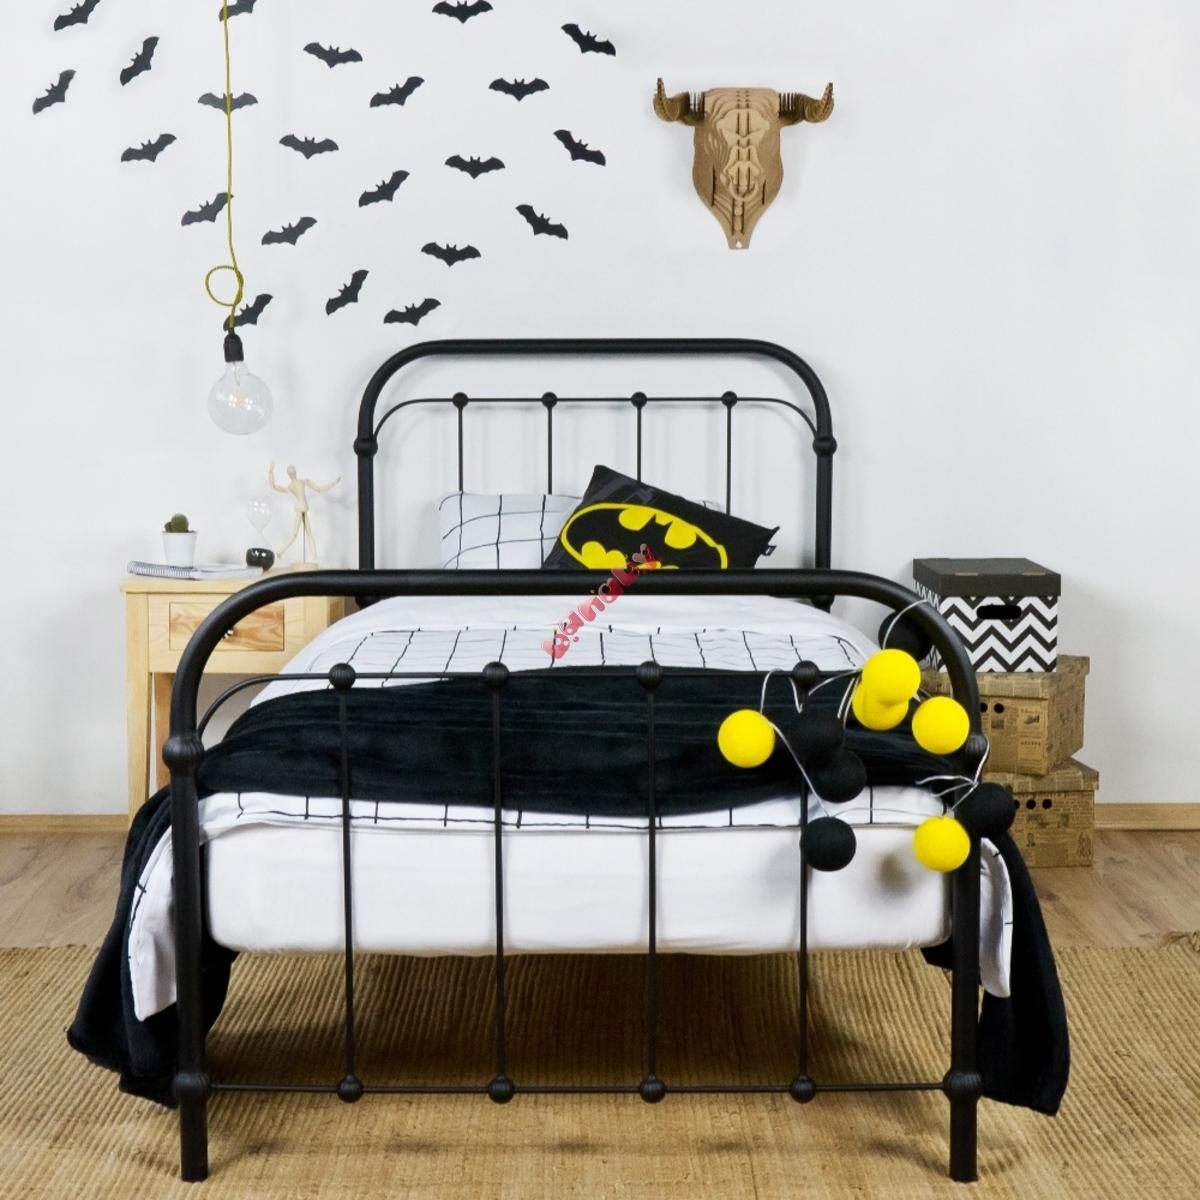 95582bb57c2d Kovová postel Bibi 200x90 cm černá - banaby.cz